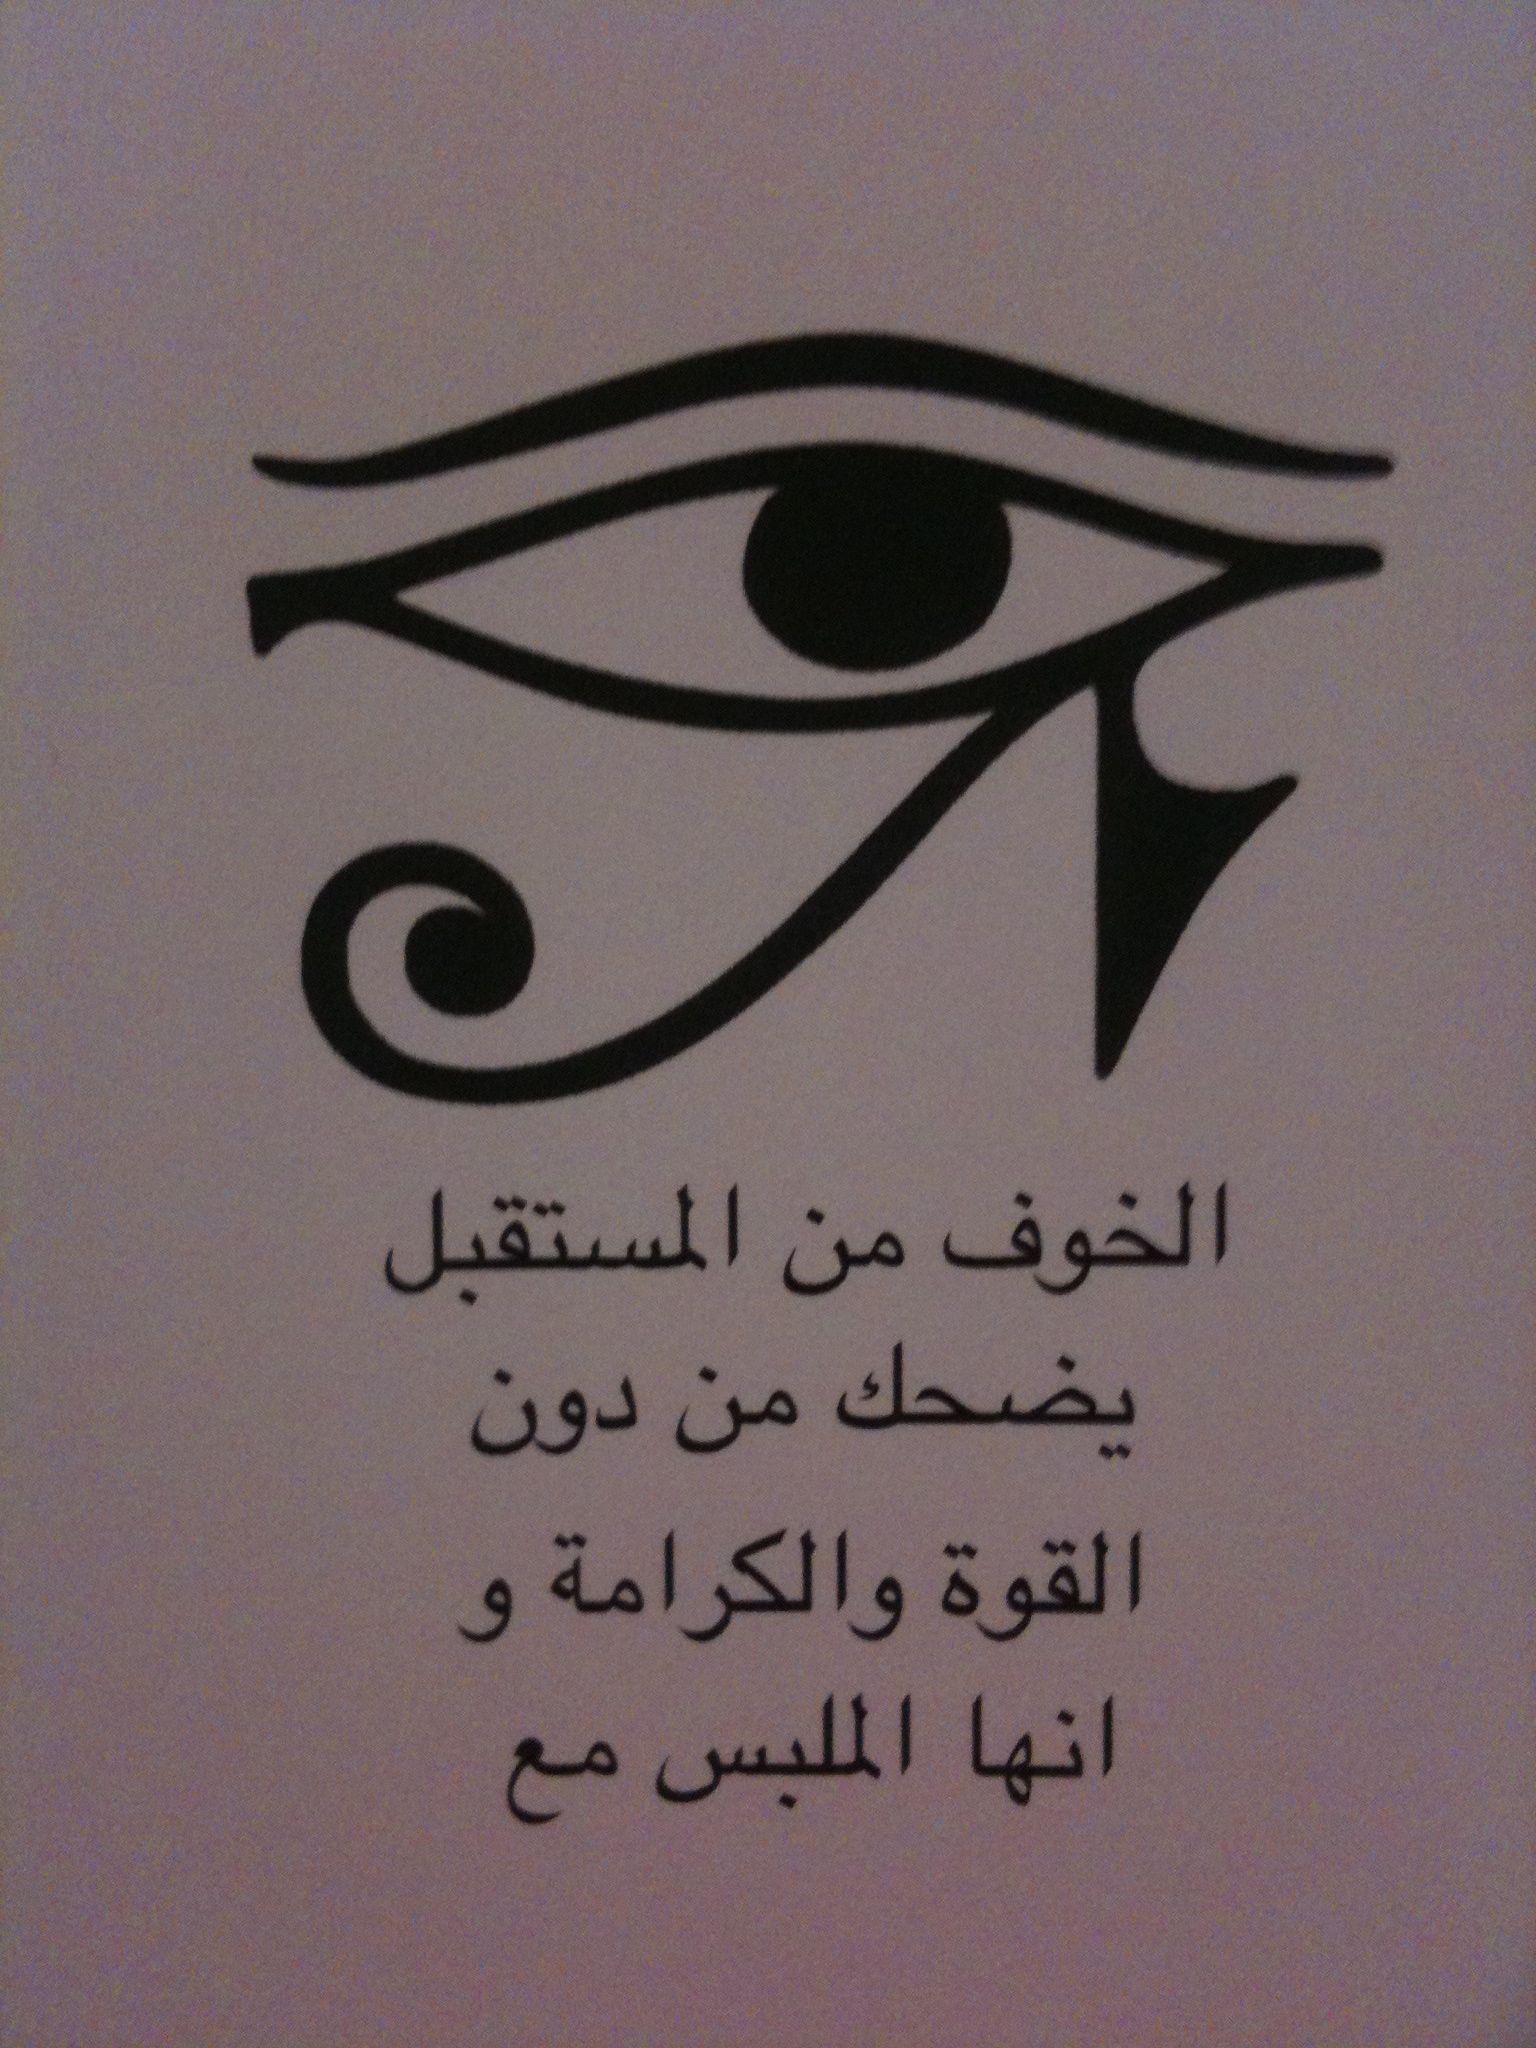 Pin By Eileen Garcia On Beauty Arabic Tattoo Quotes Faith Tattoo On Wrist Arabic Tattoo